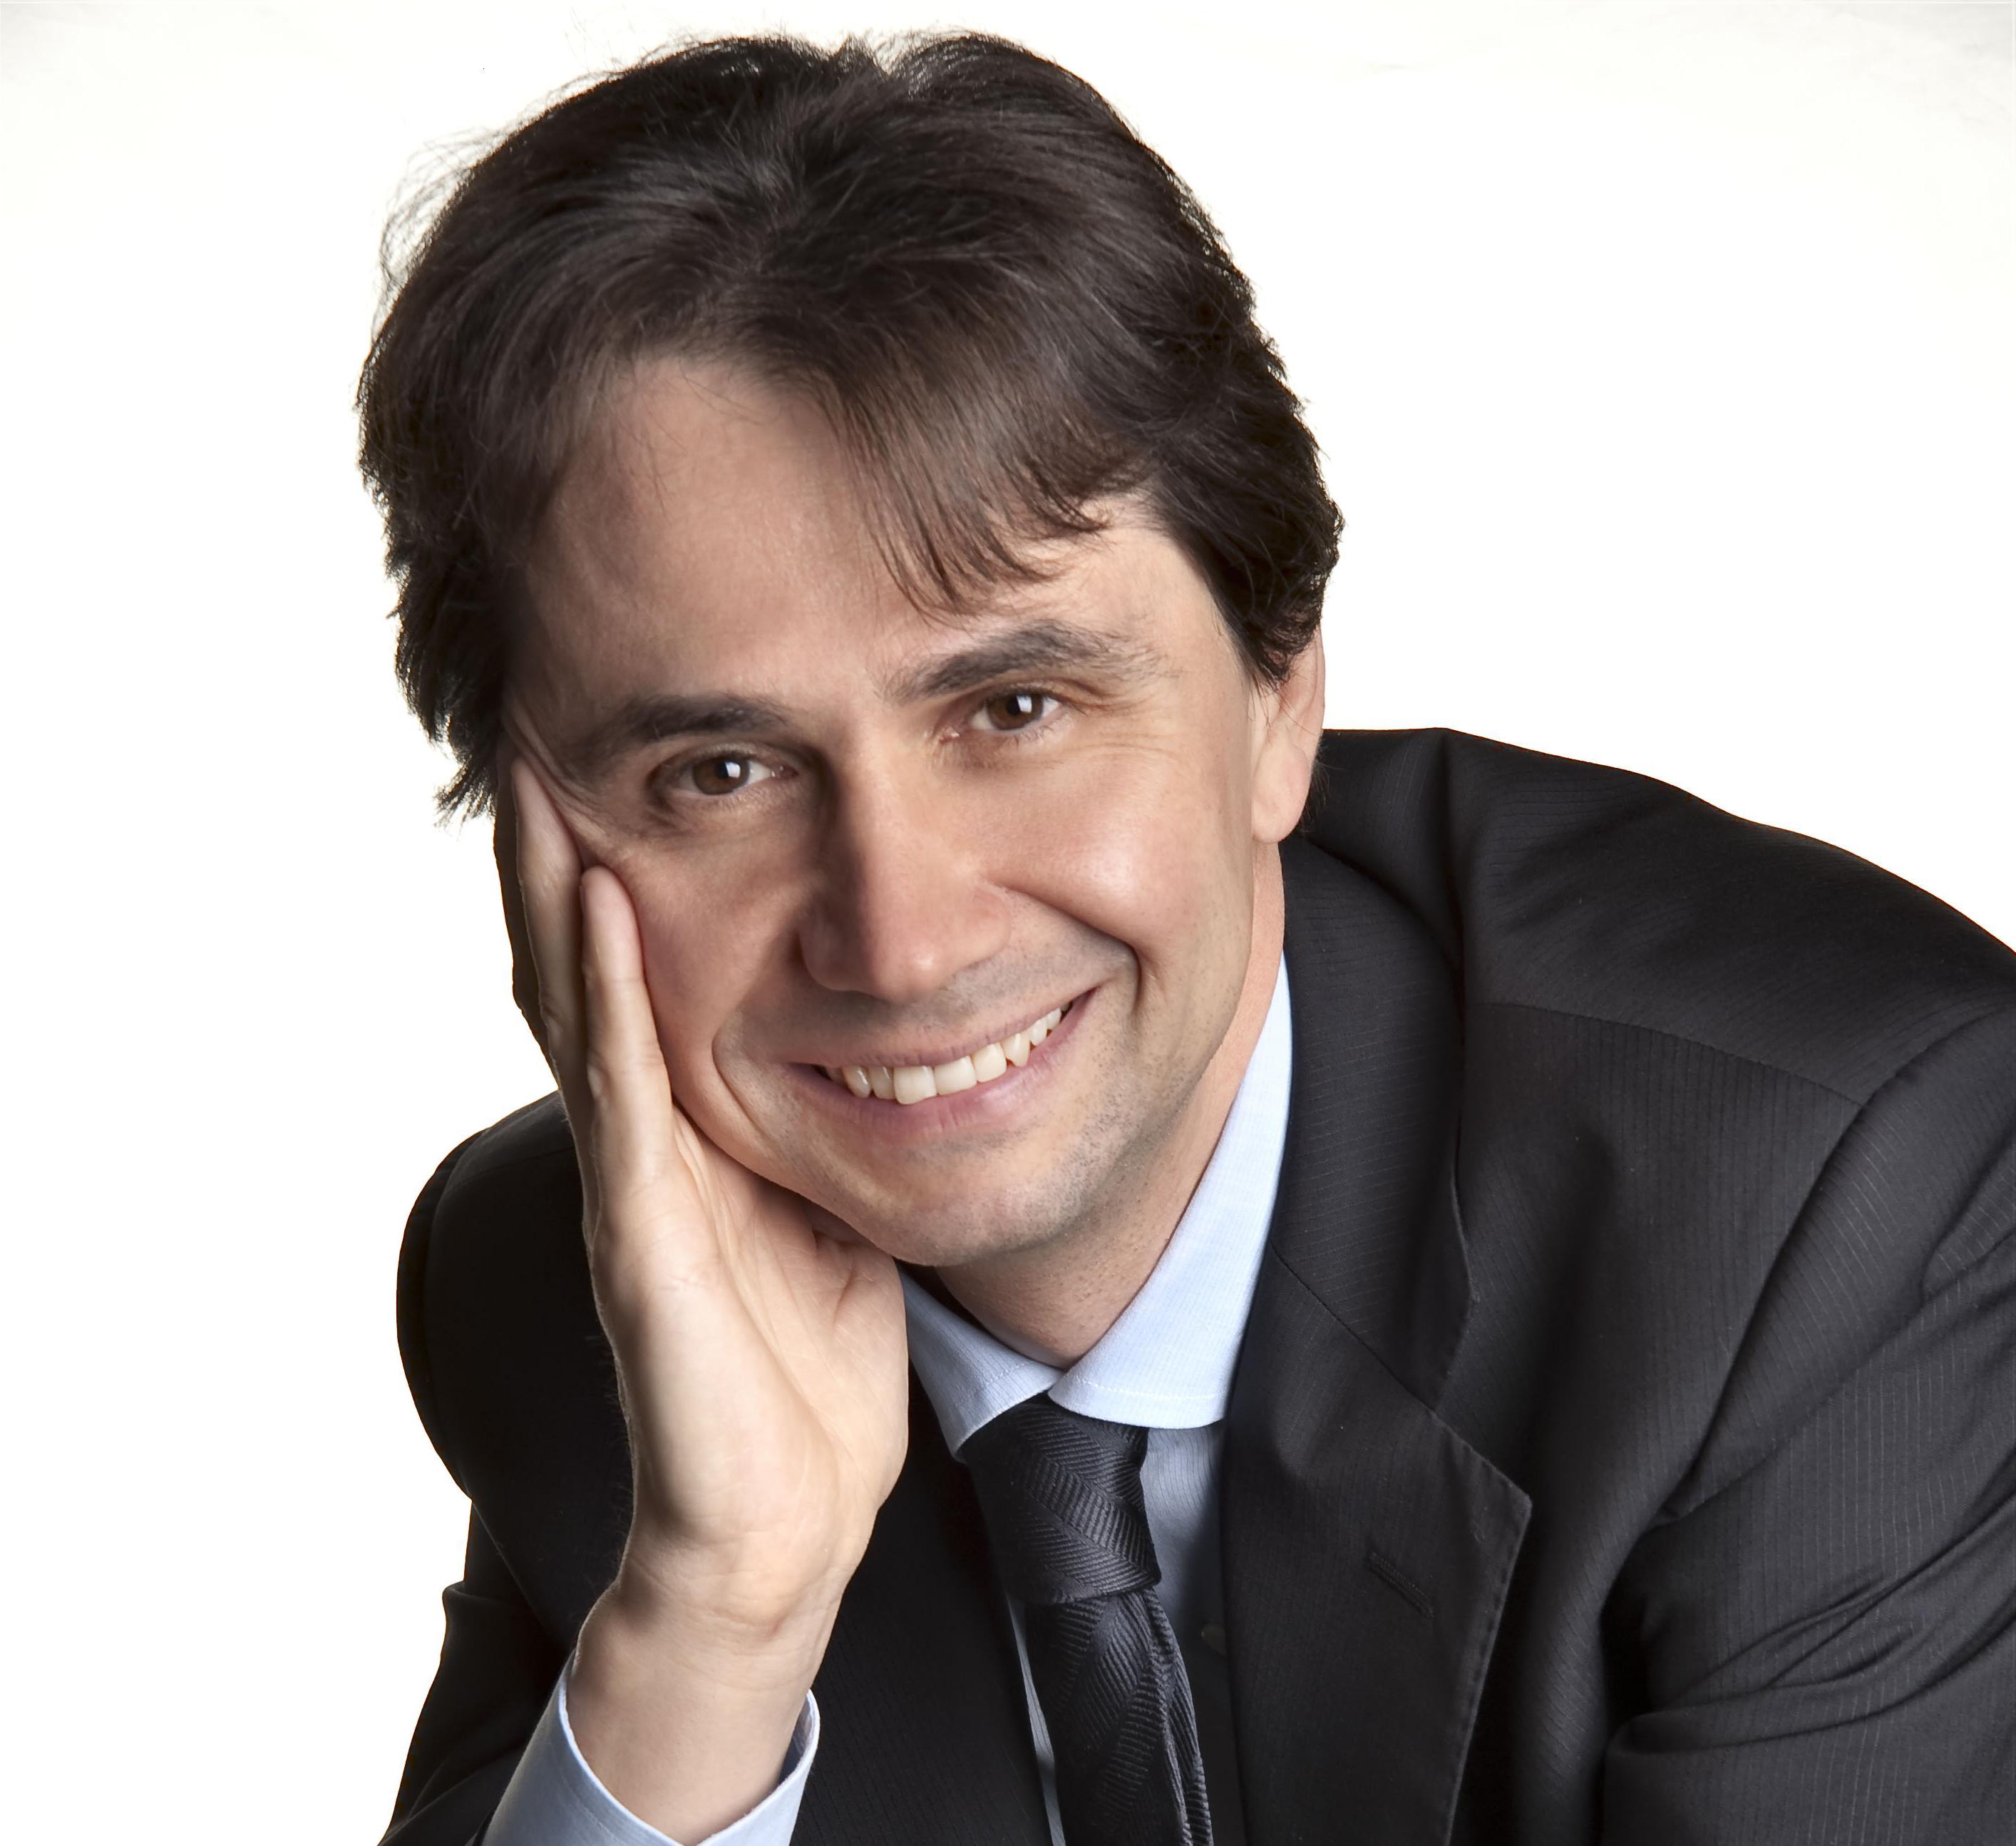 https://www.promotionmagazine.it/wp/wp-content/uploads/2013/06/MarcelloPincellio.jpg